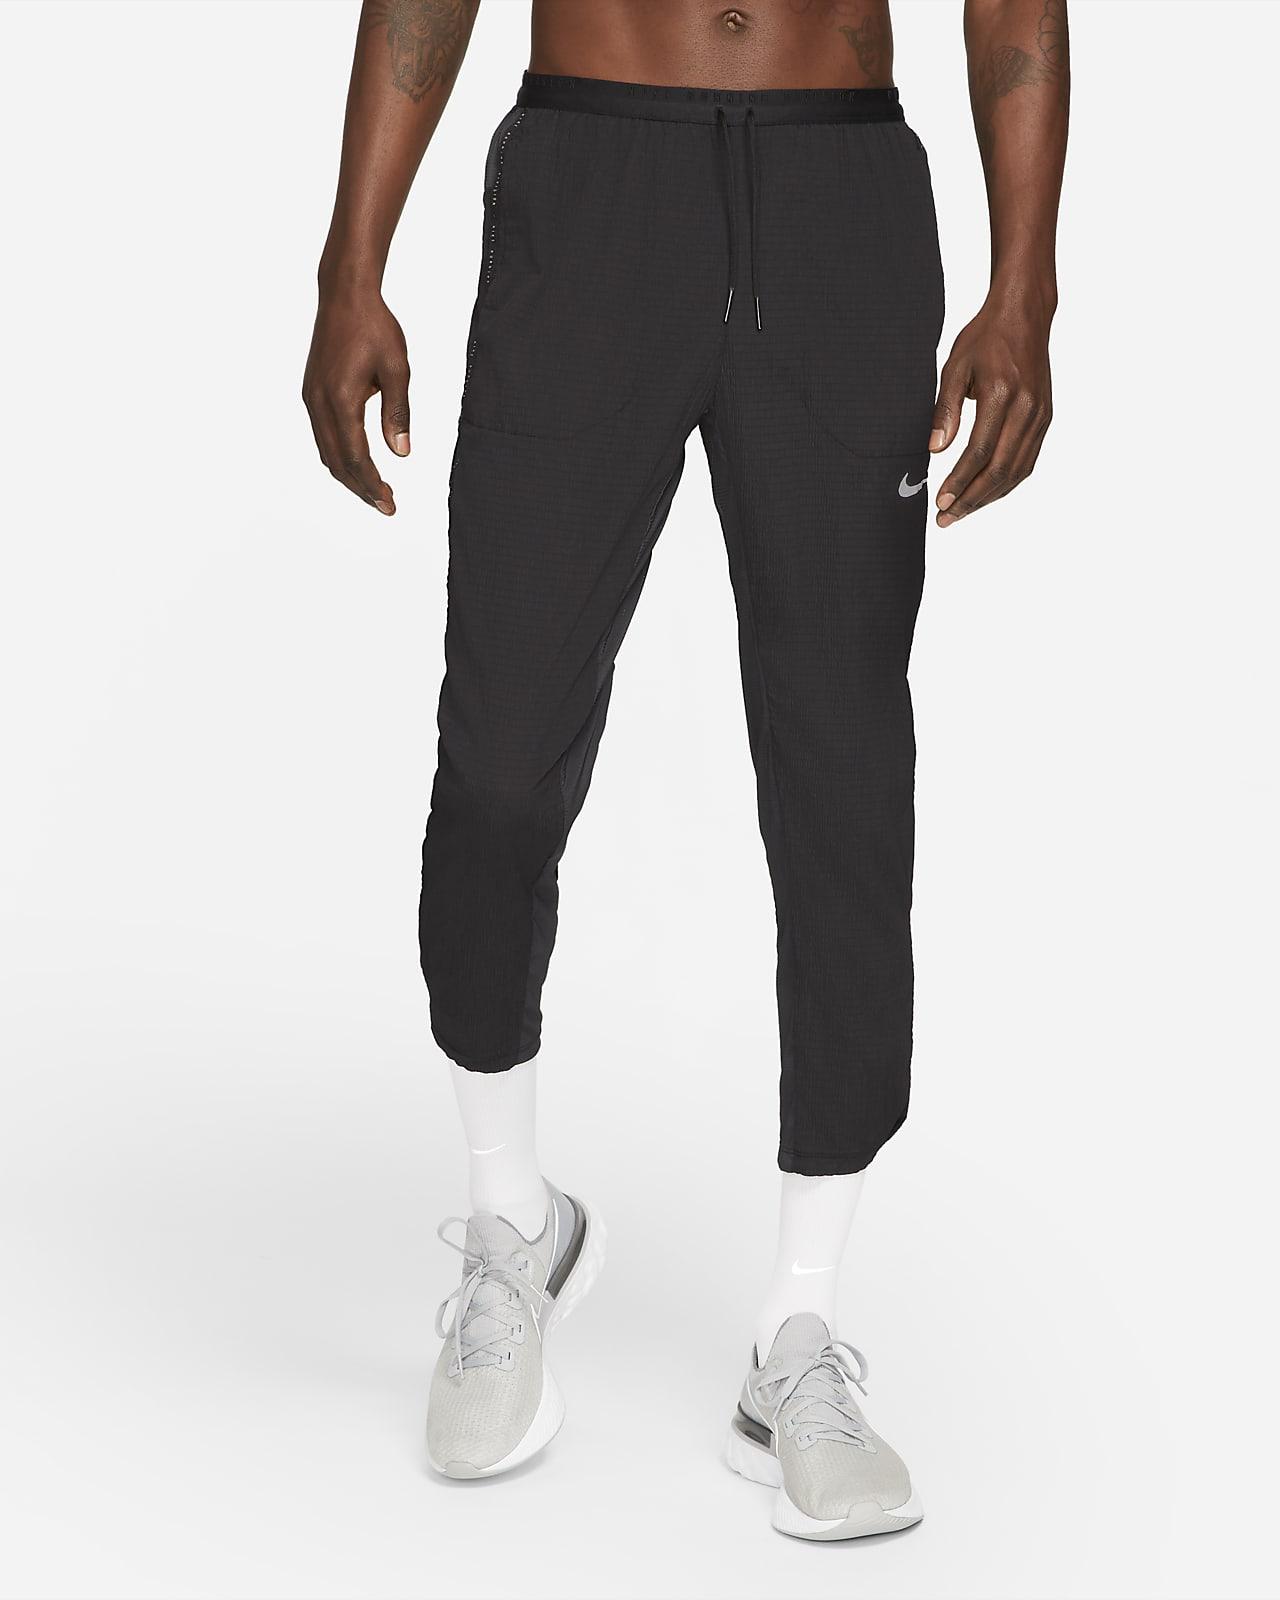 Nike Phenom Elite Run Division Men's Running Trousers